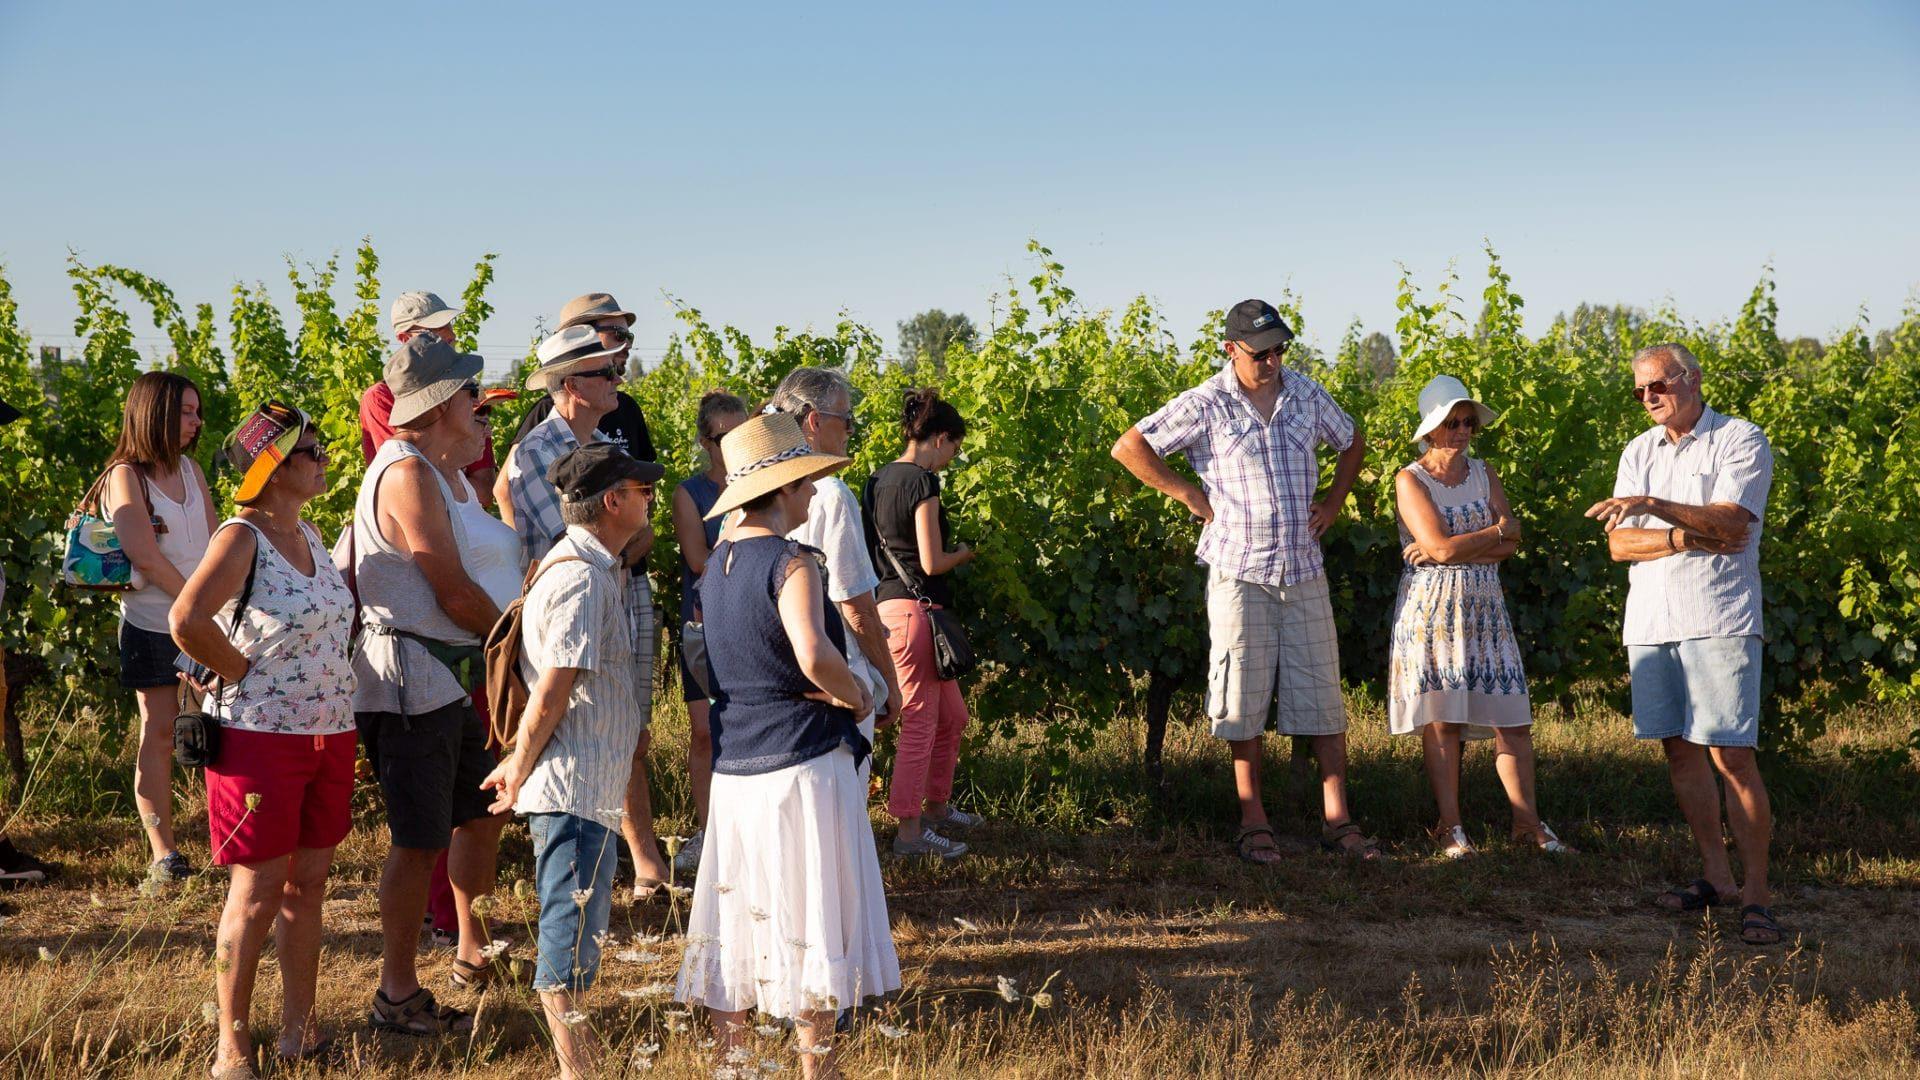 Festibalades : dîner chez le vigneron